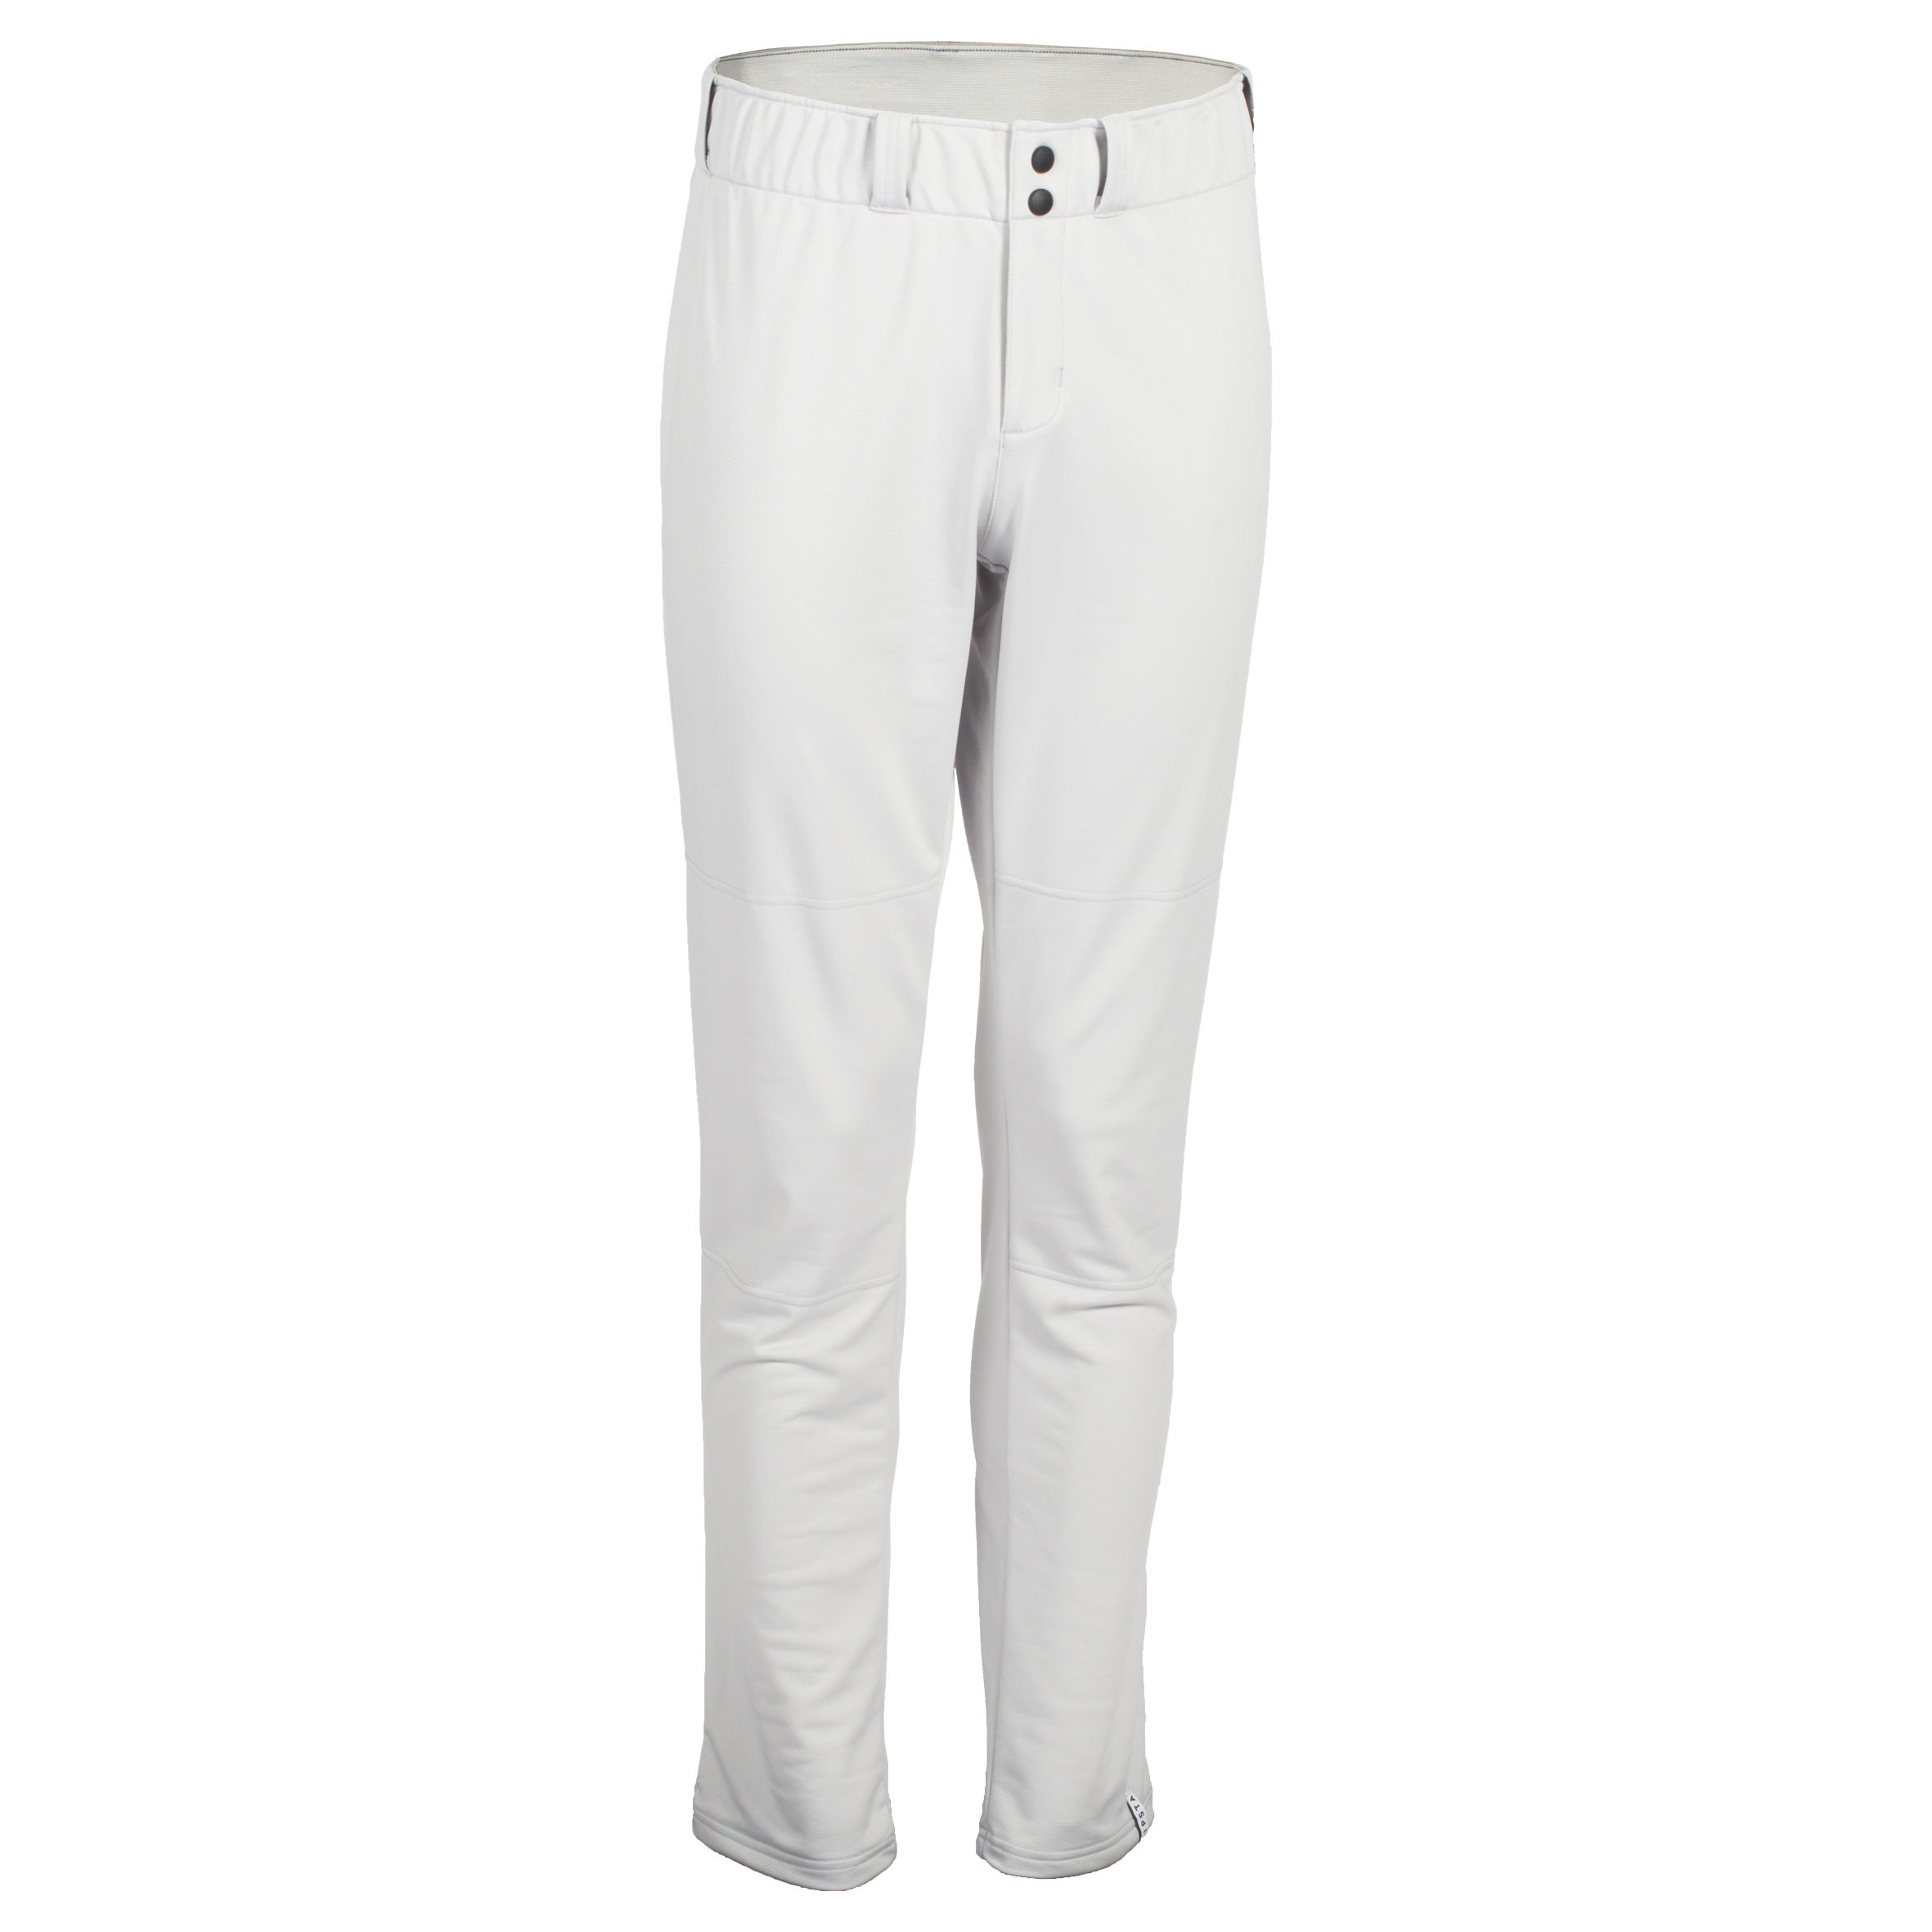 Pantalon BA 550 Gri imagine